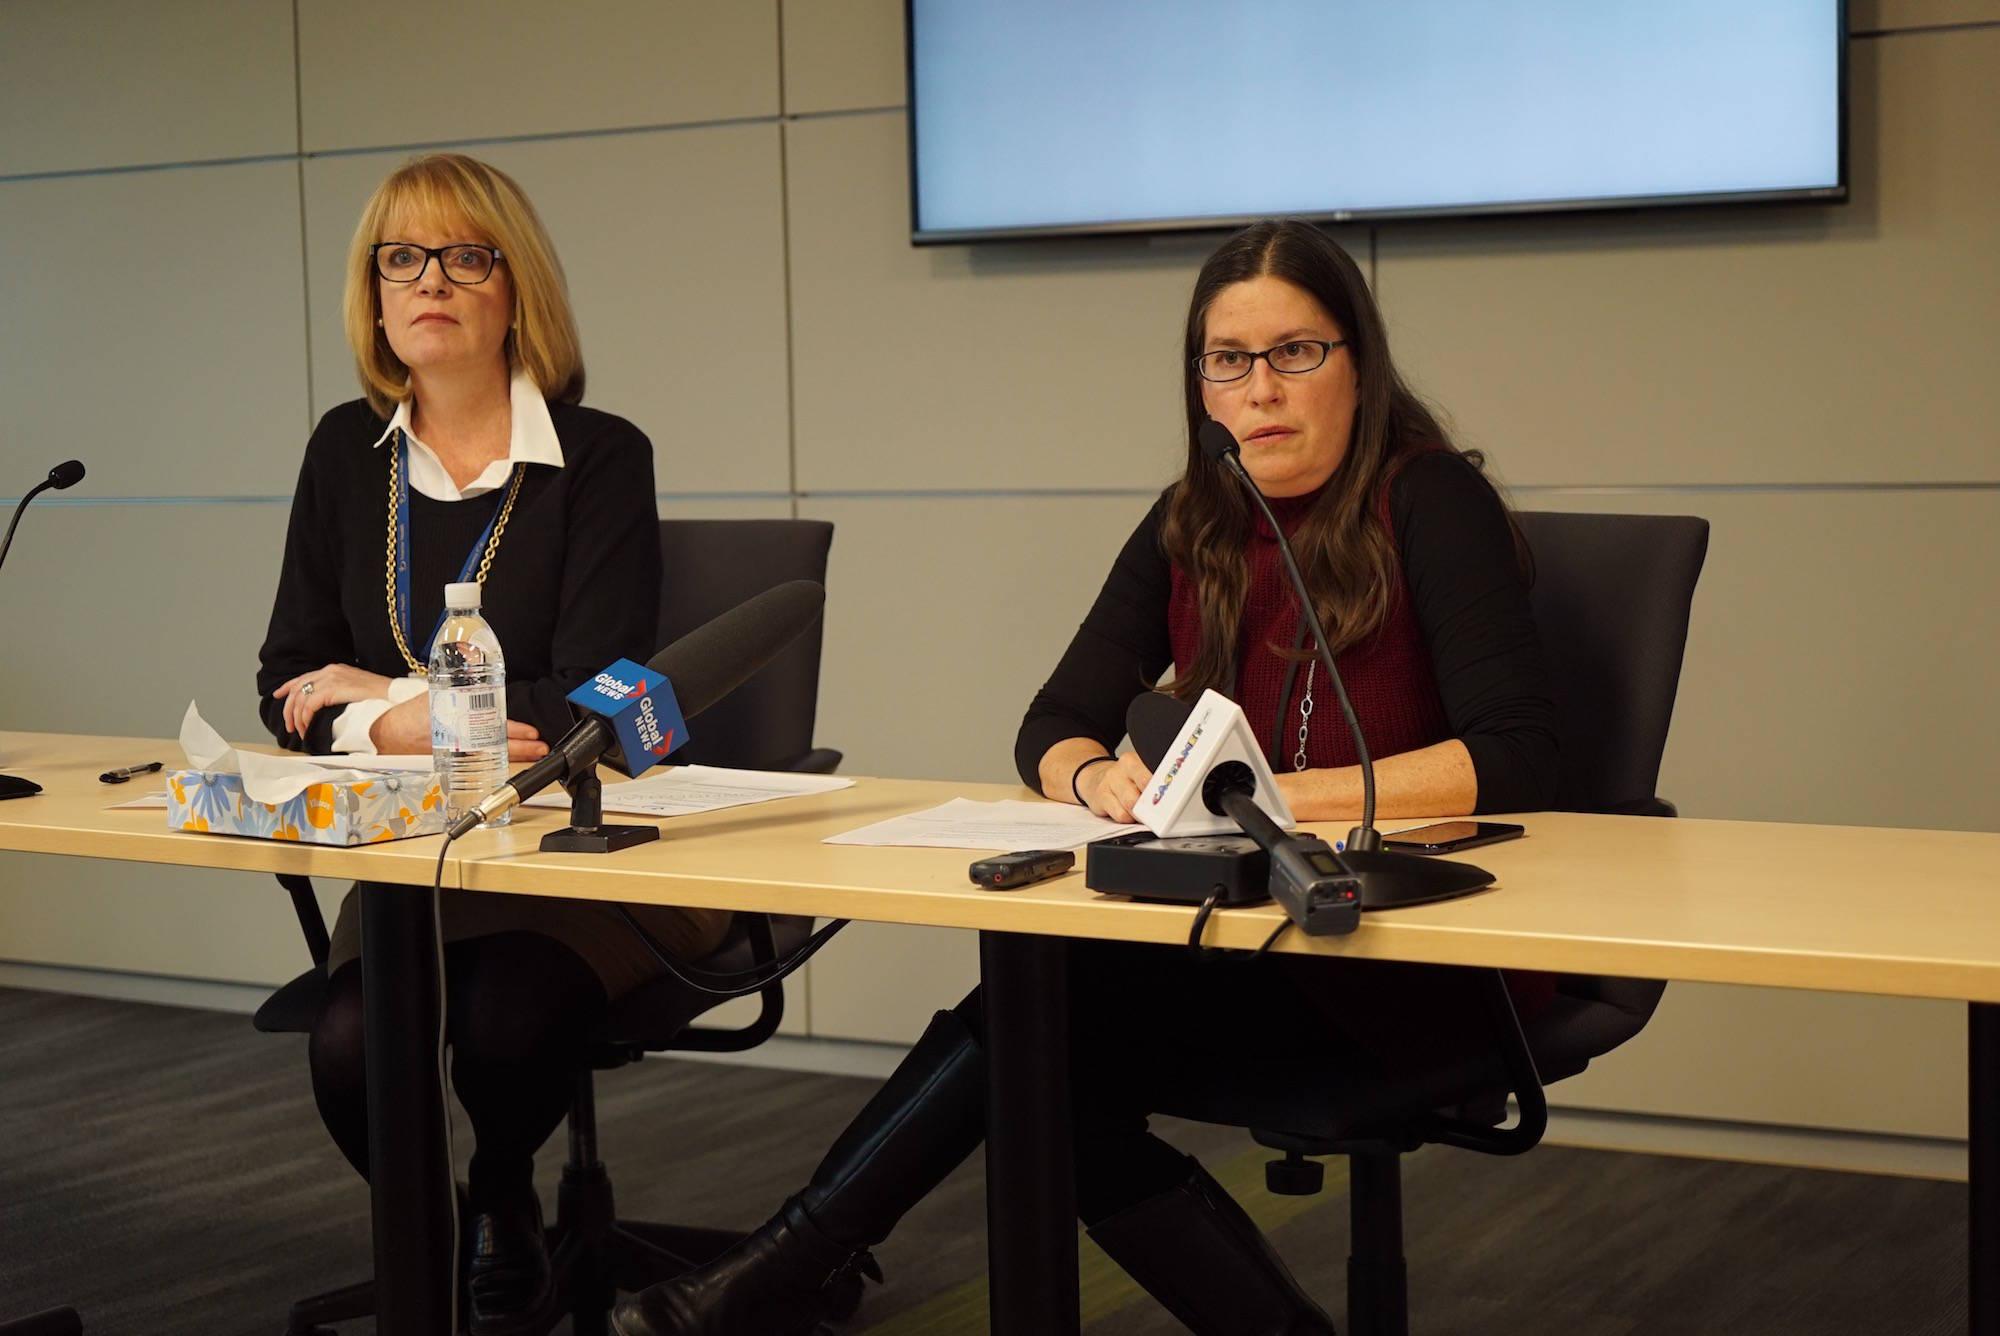 Interior Health communications administrator Deborah Preston, left, and medical health officer Dr. Karin Goodison update media on declaring an outbreak of meningococcal disease in the Okanagan. (Carmen Weld/Black Press)